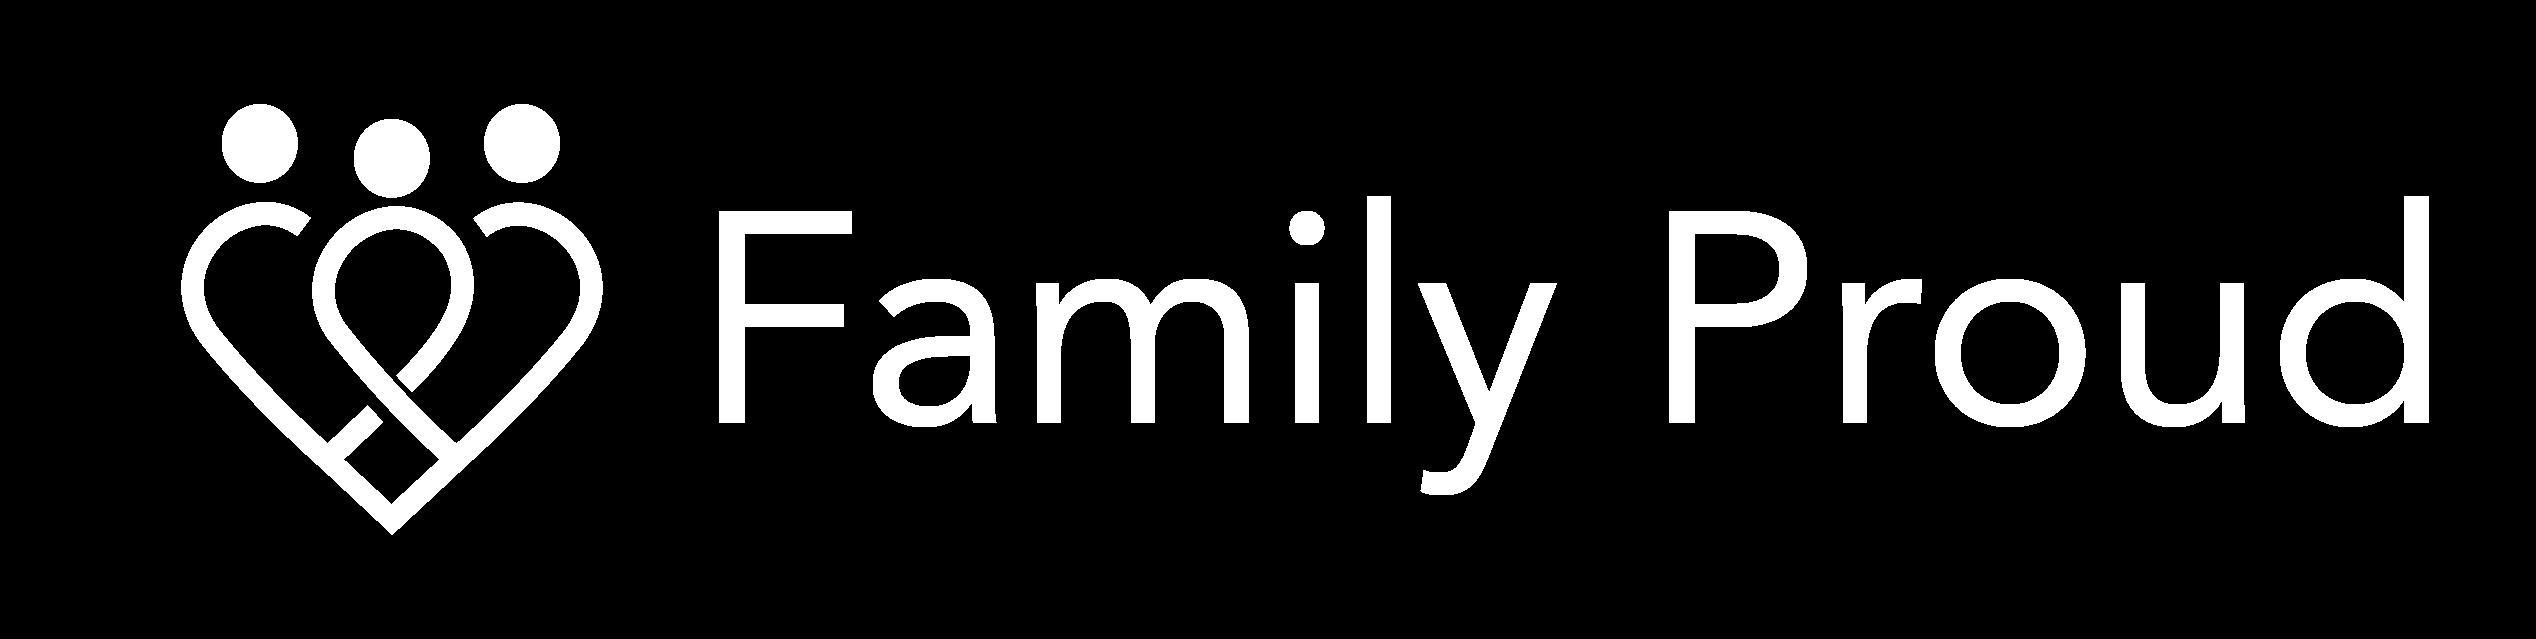 Family Proud